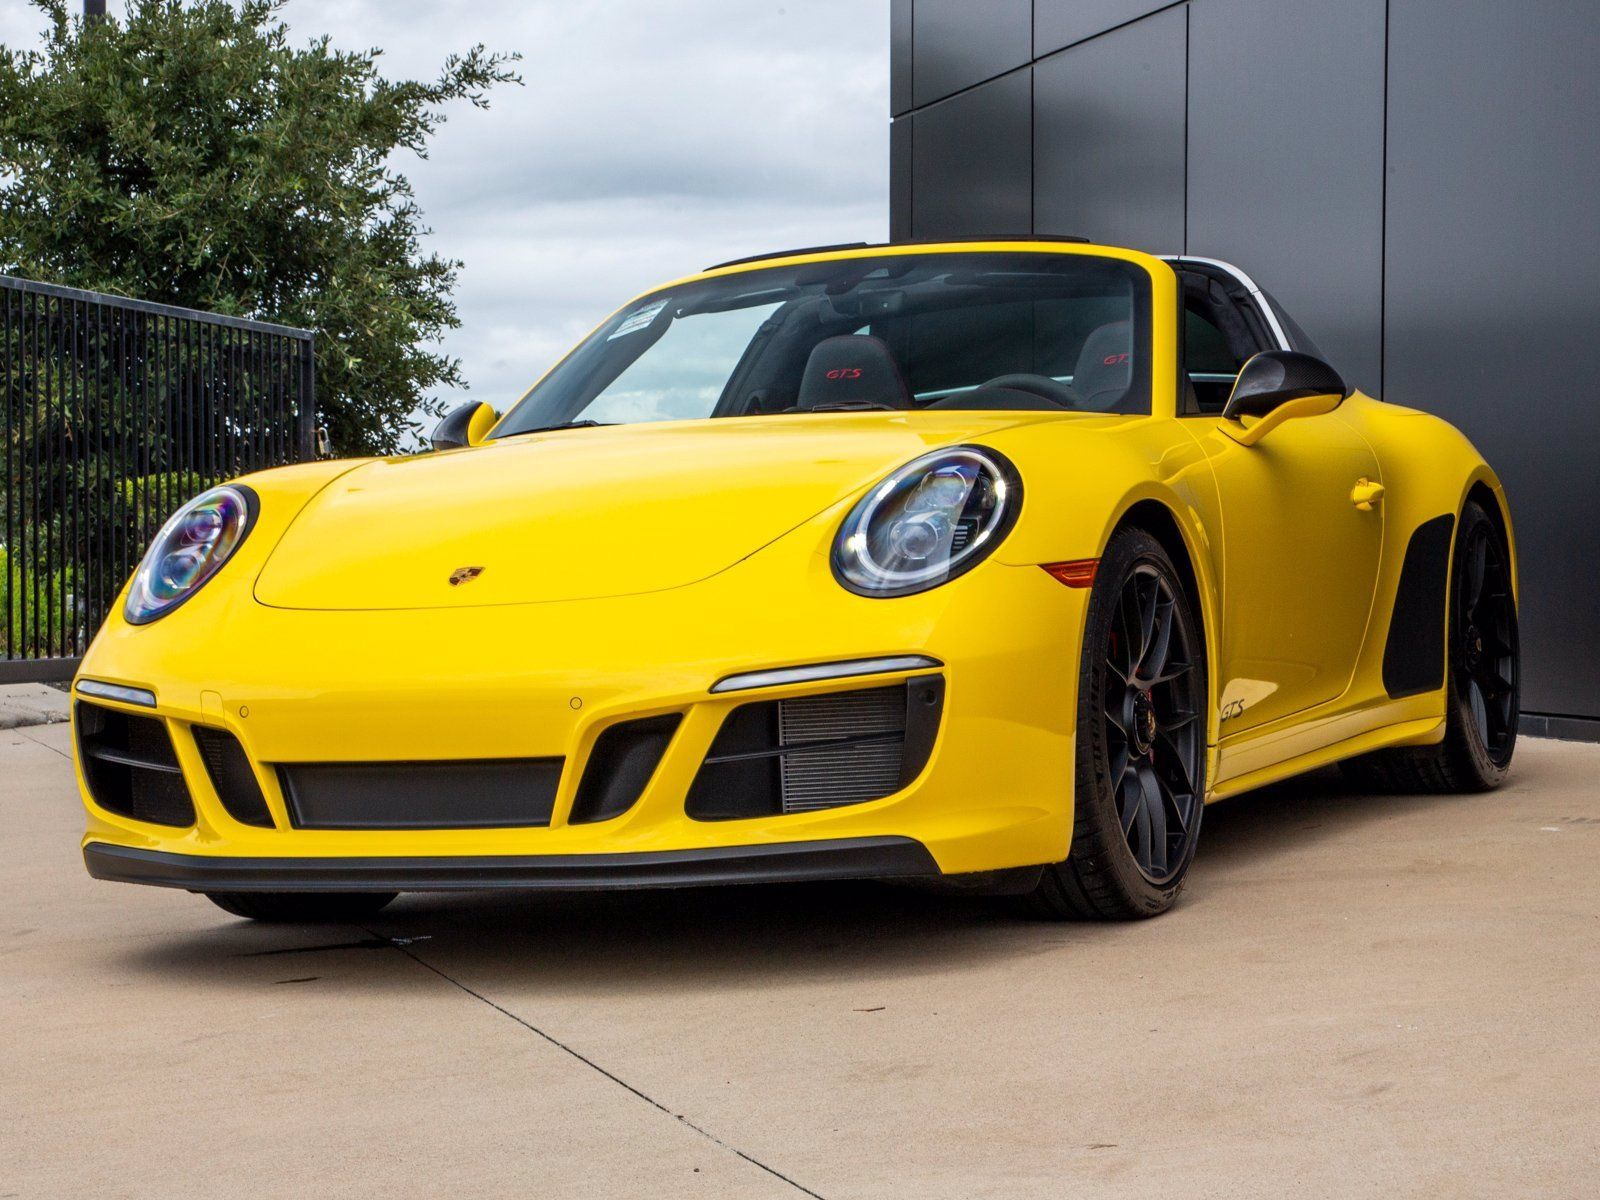 2019 Porsche 911 Targa 4 GTS – 3